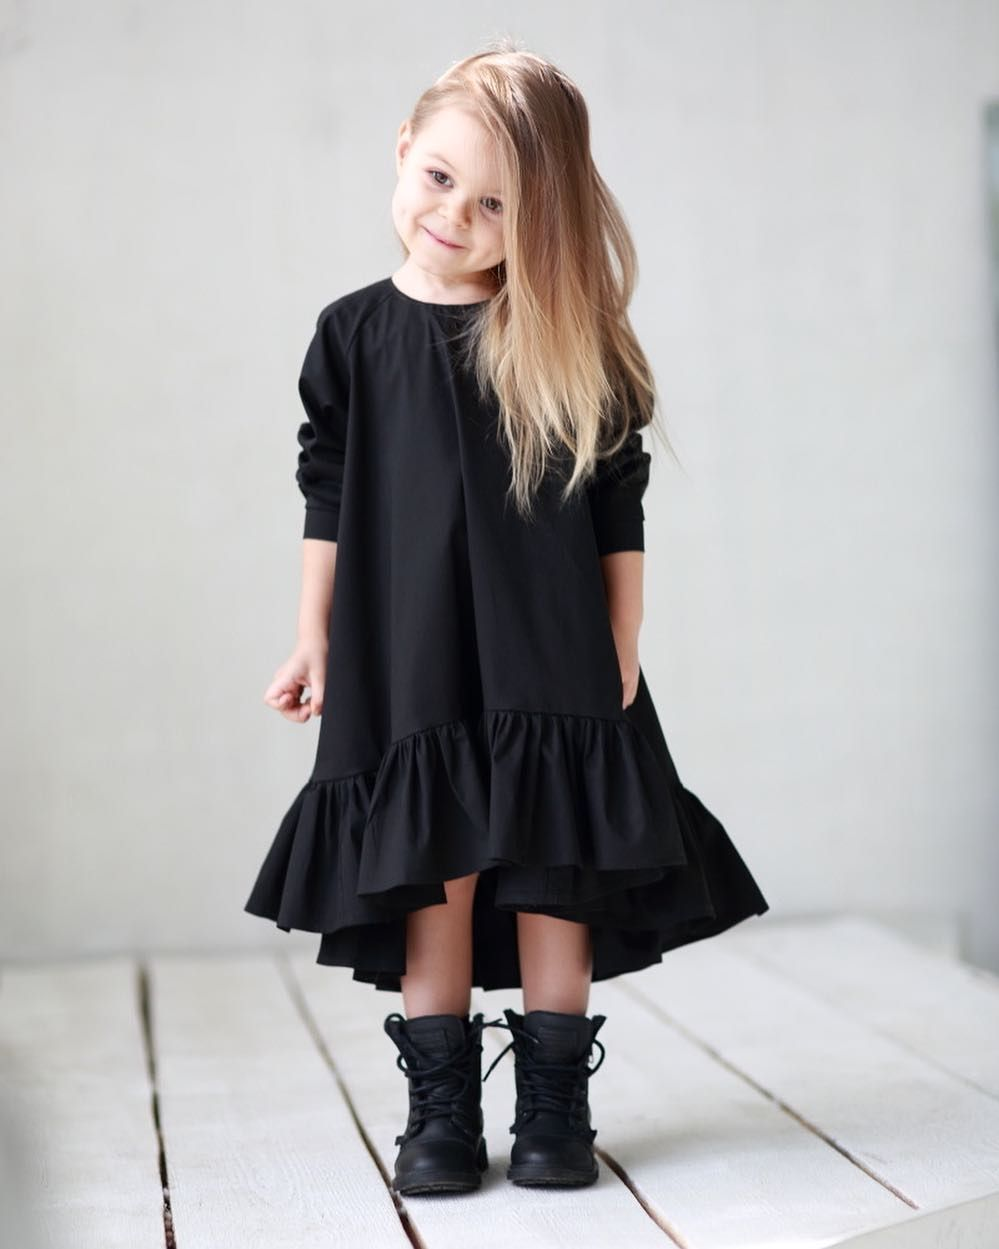 "815 Likes, 24 Comments - miko | concept kids wear (@miko_kids) on Instagram: ""❗️-30%❗️Черное платье-волан.Состав: 100% хлопок .Старая цена :5000.Новая: 3500.Размер в наличии :…"""